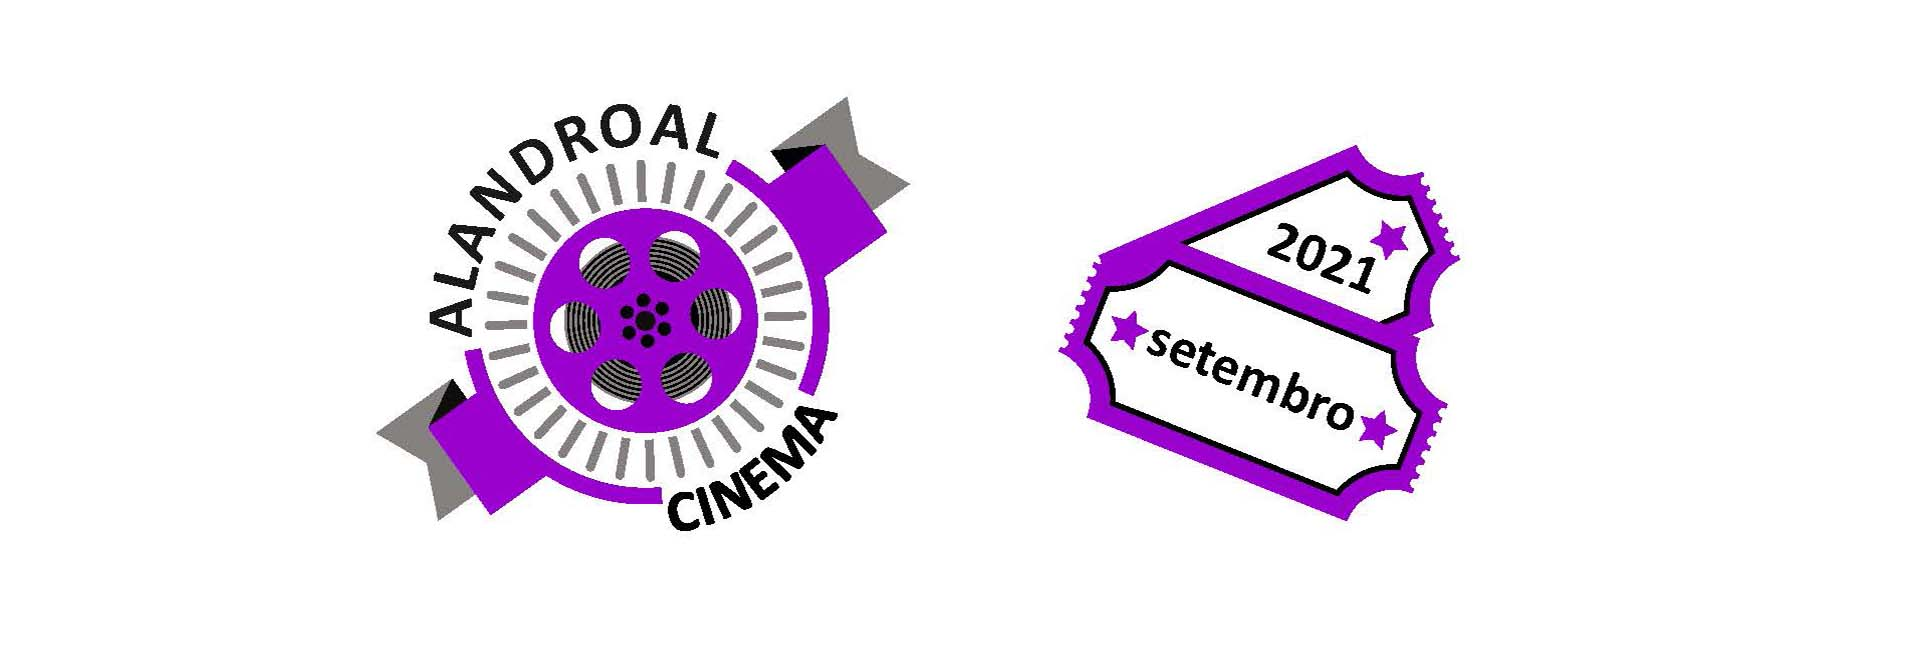 CinemaAlandroal8211Setembro_1631863864